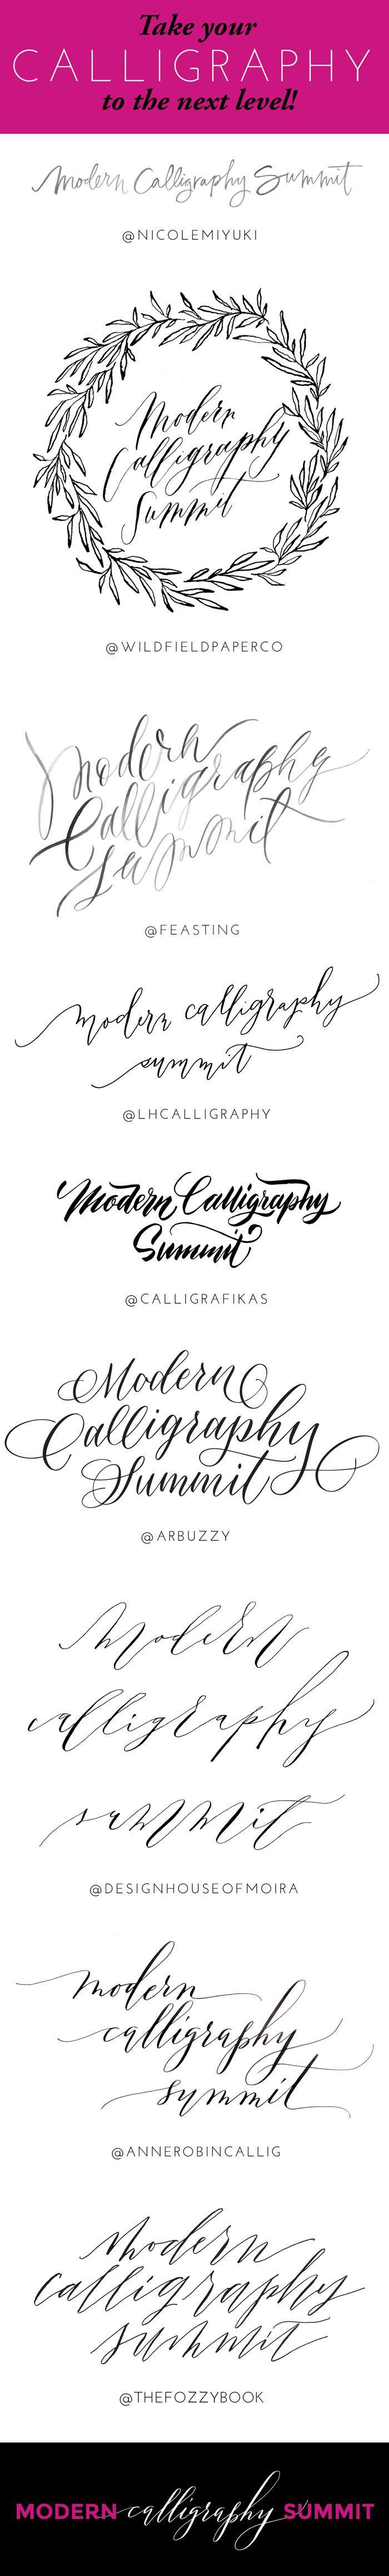 Modern Calligraphy Summit - Online calligraphy workshops